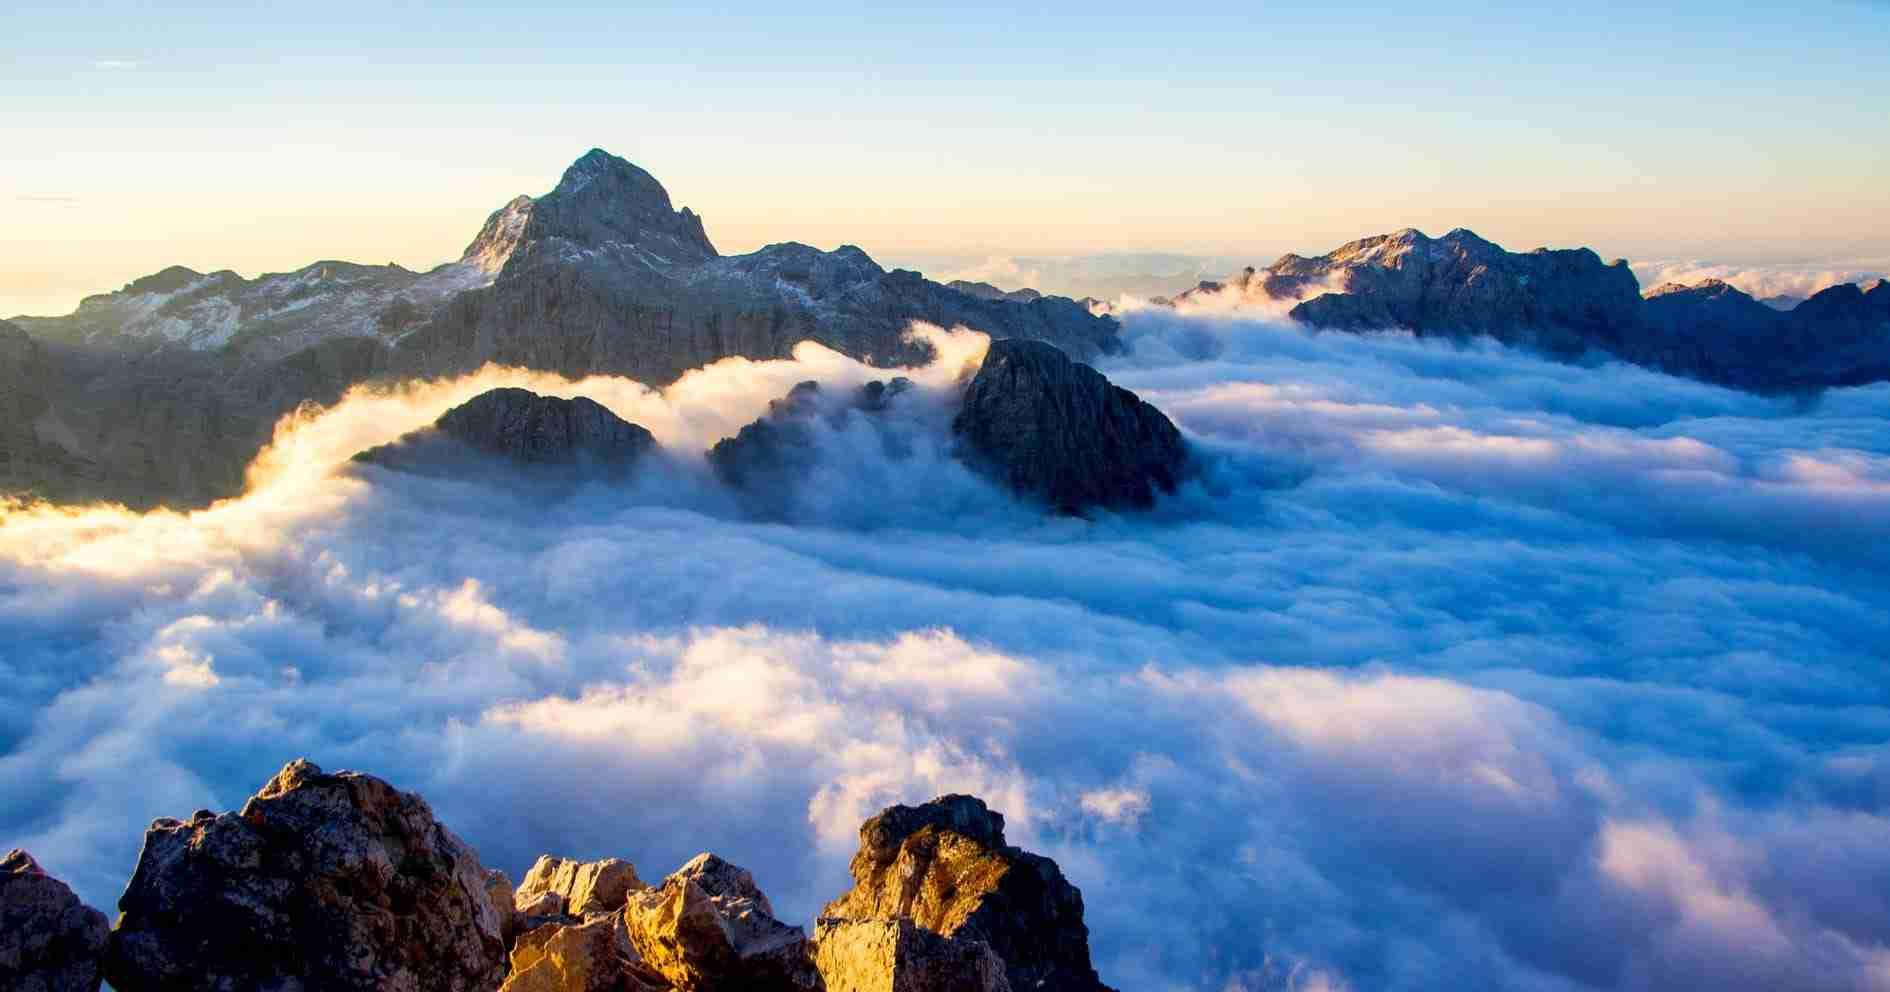 Julian Alps Traverse and Mount Triglav